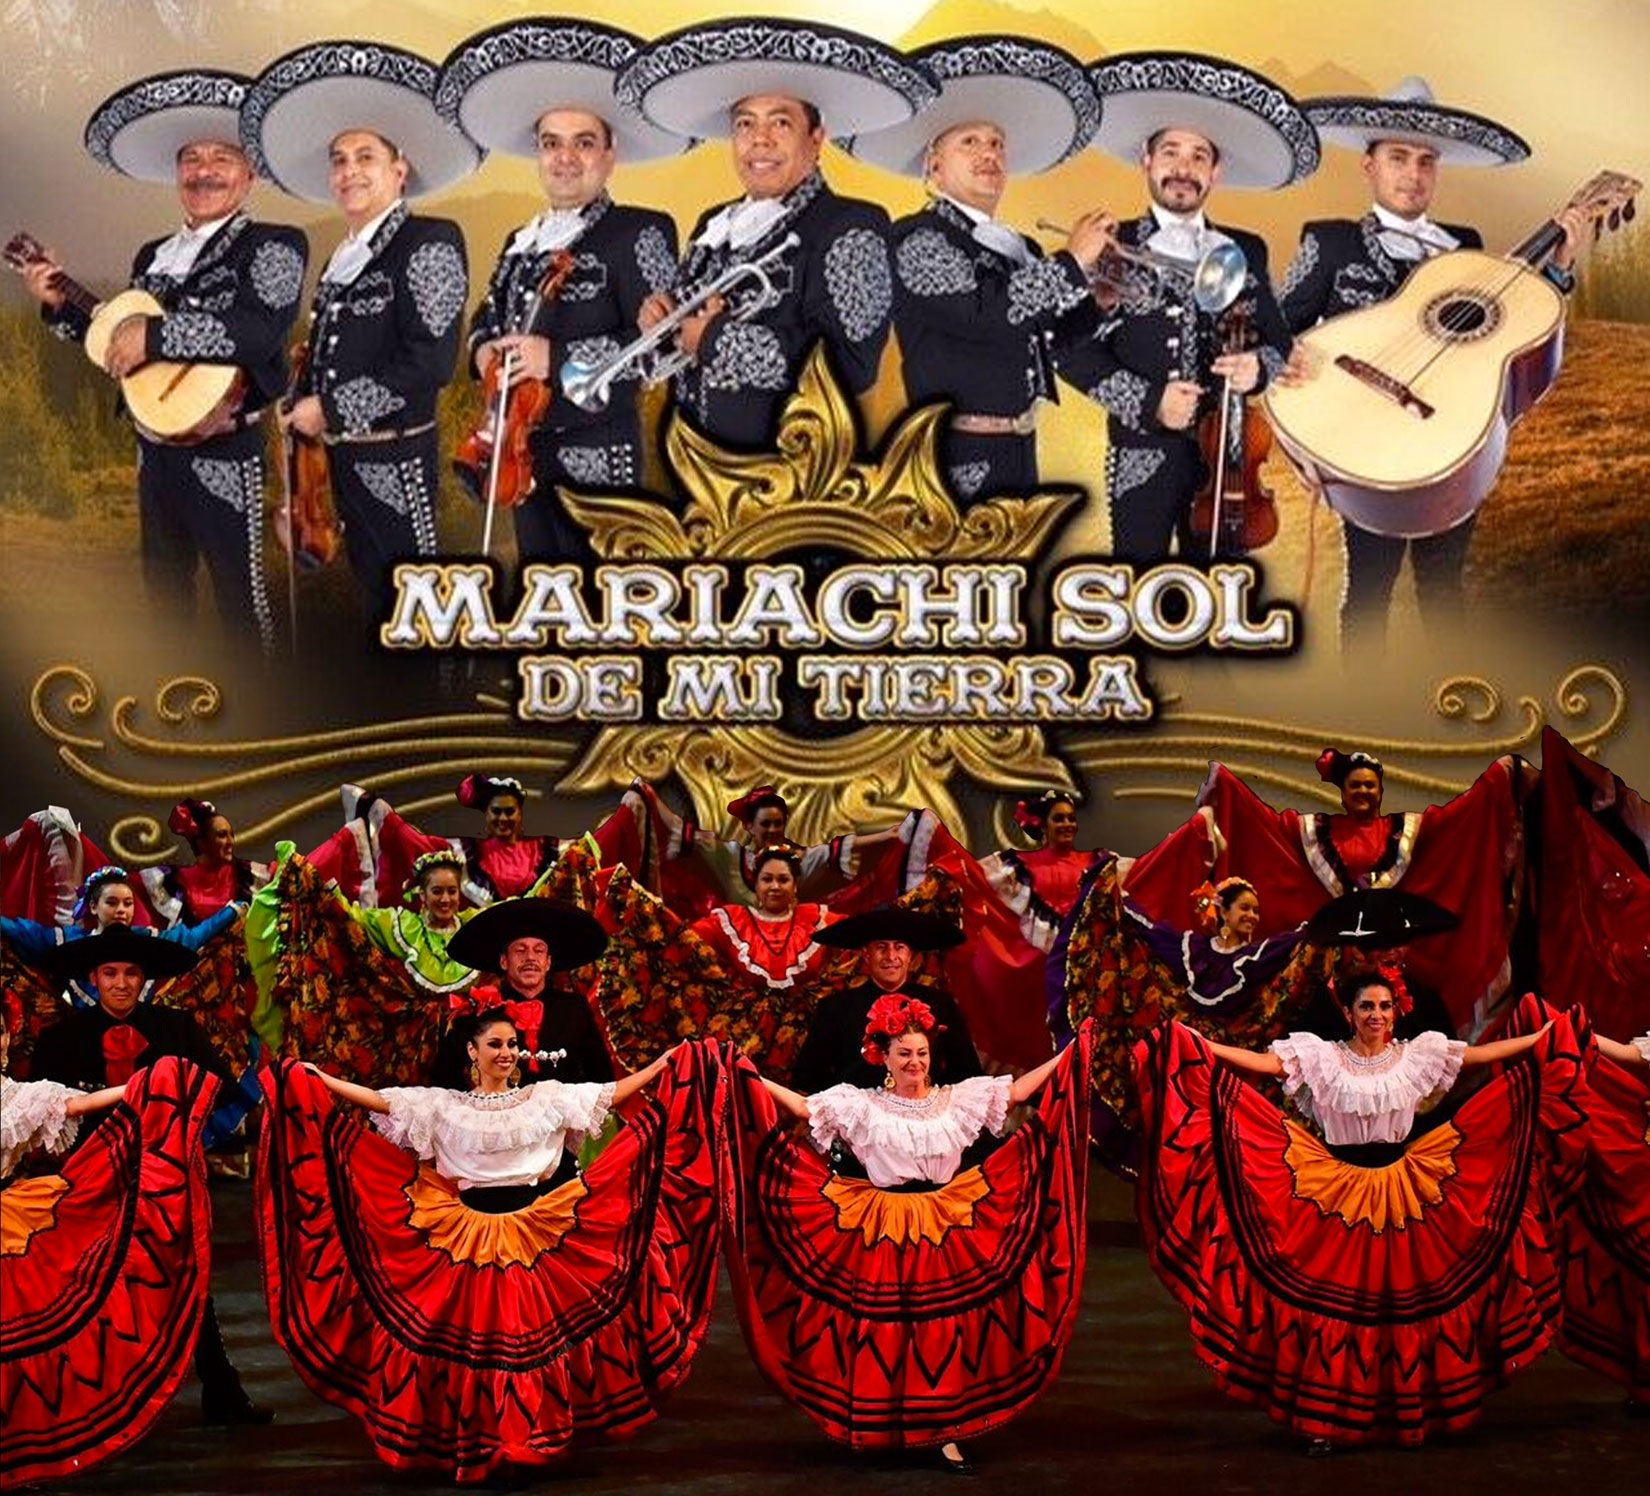 8-25---Mariachi-Sol-de-mi-Tierra-with-Fiesta-Colorado-Dance-Company---Levitt-Pavilion-Denver-Poster.jpg